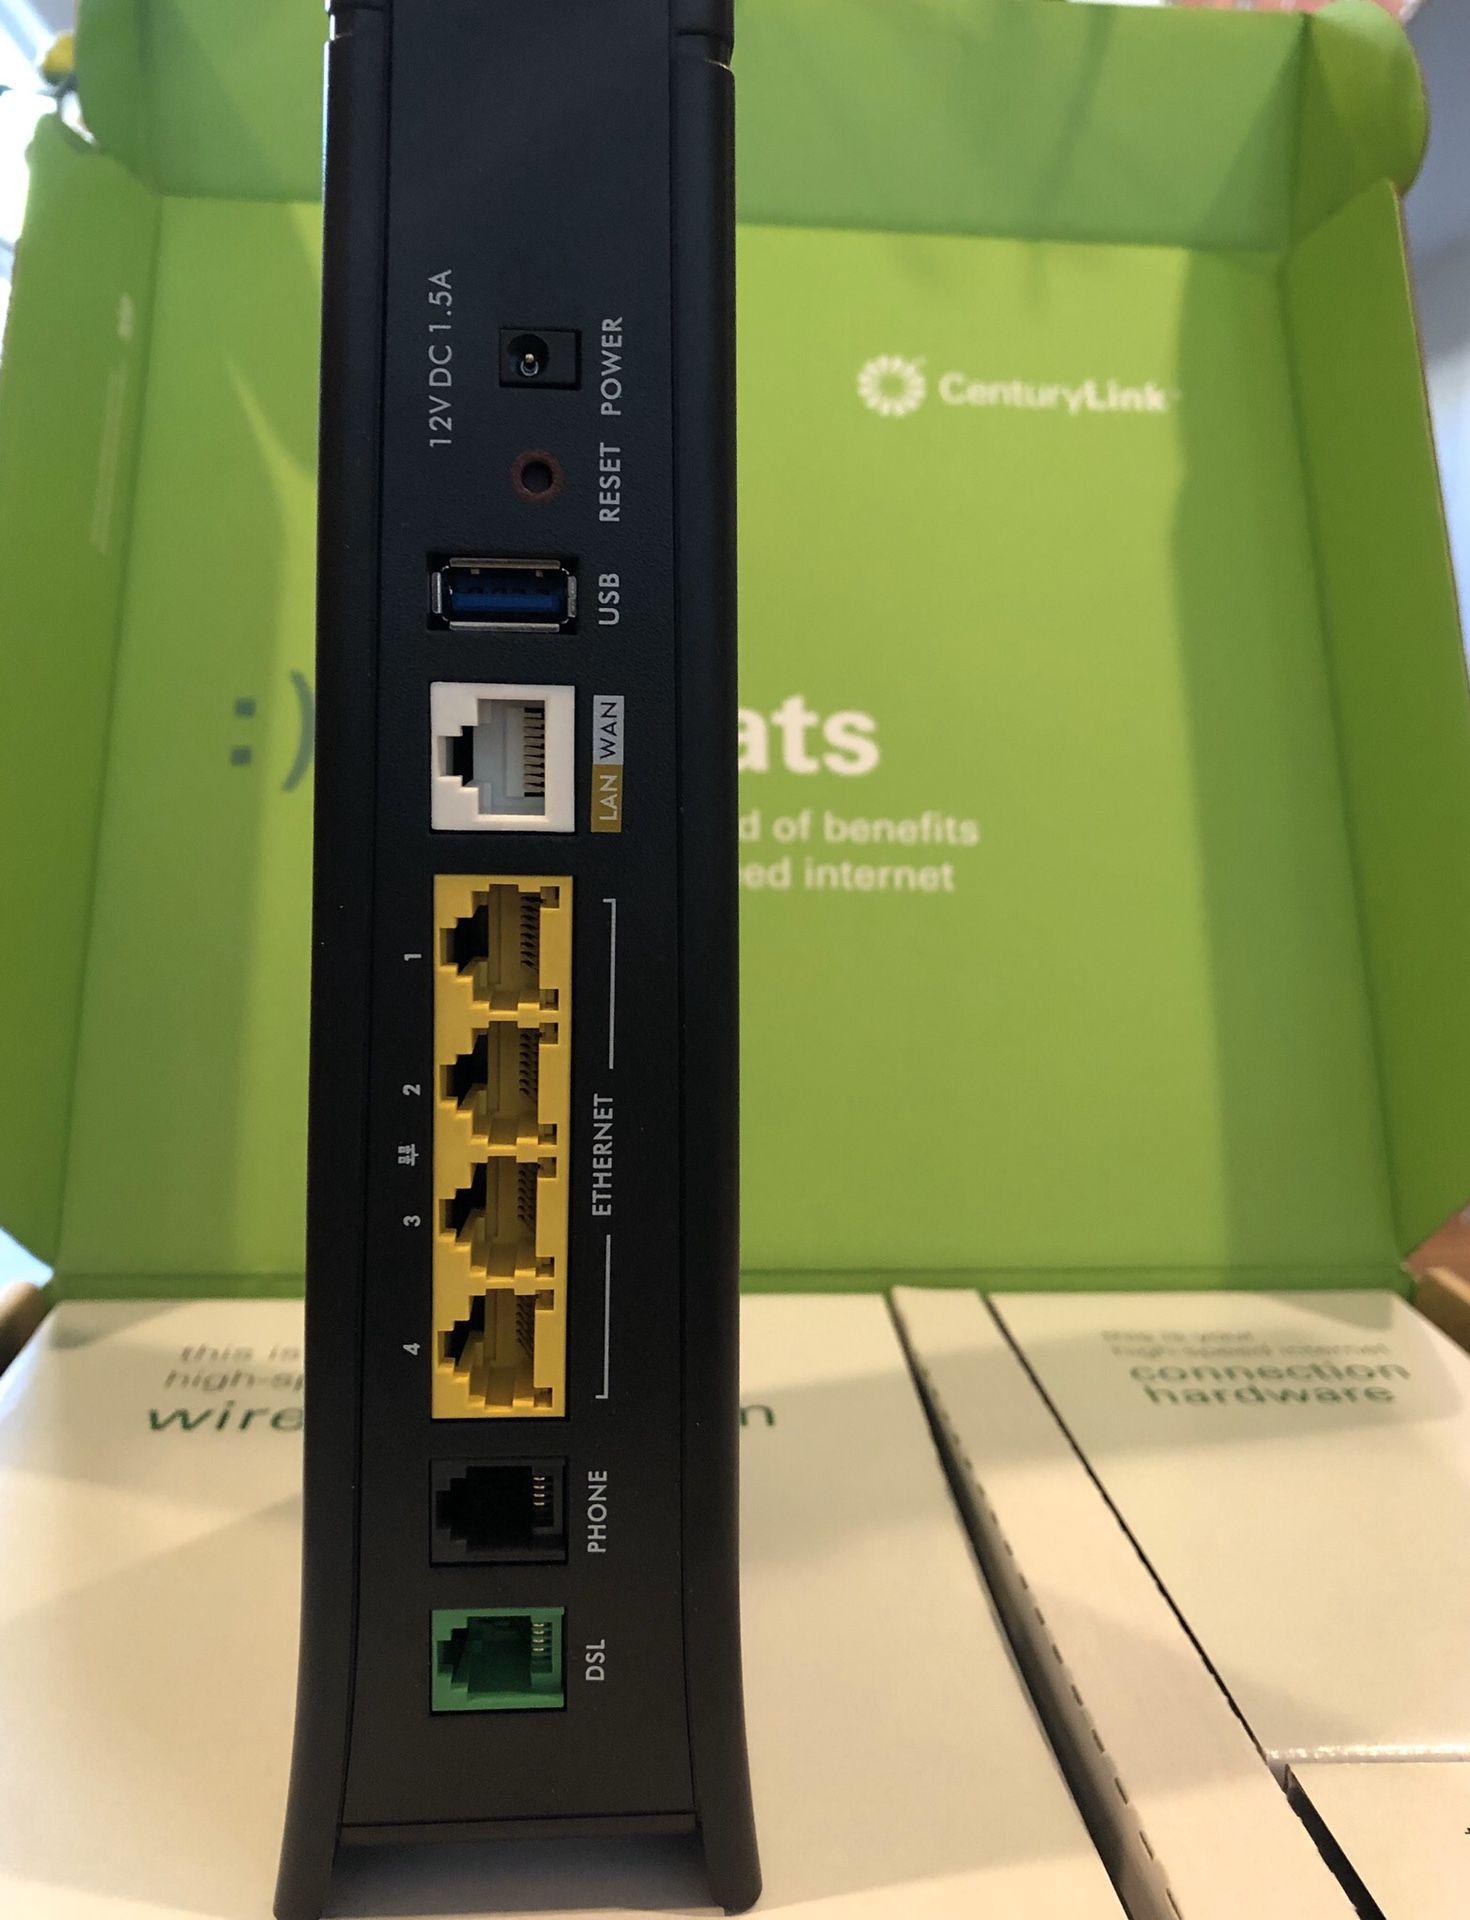 Century Link Internet Modem Router $50 OBO